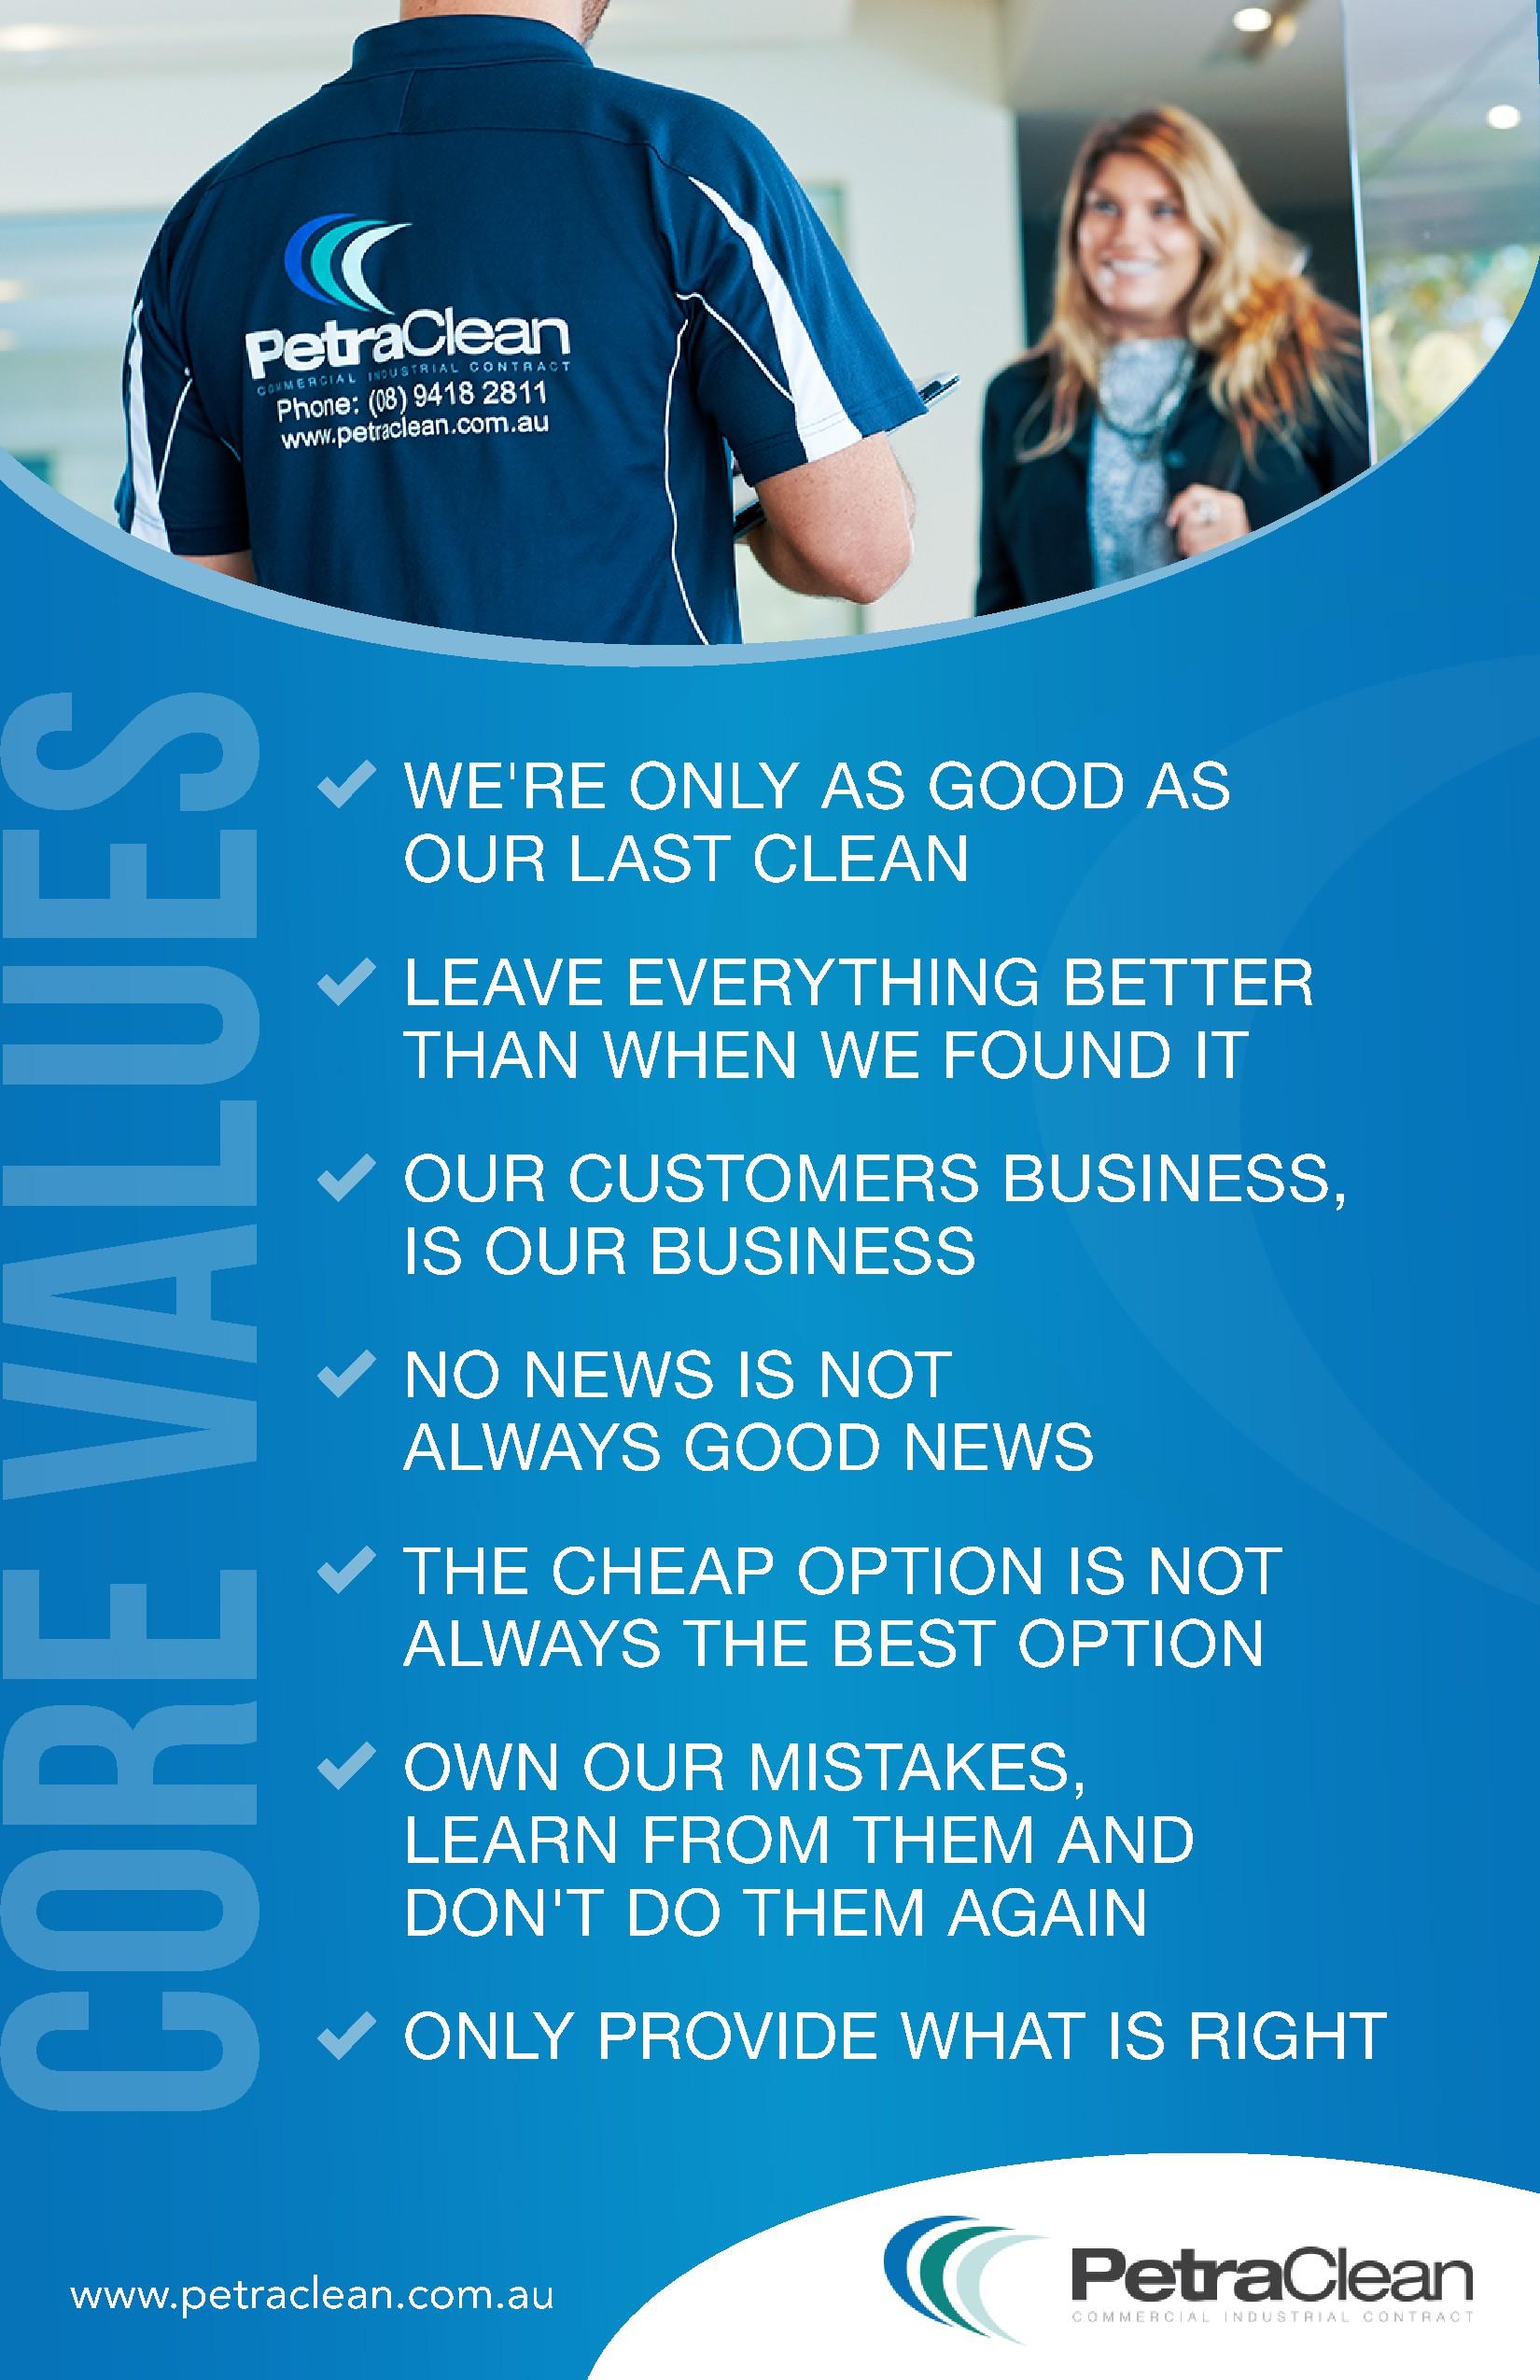 Impactful company poster